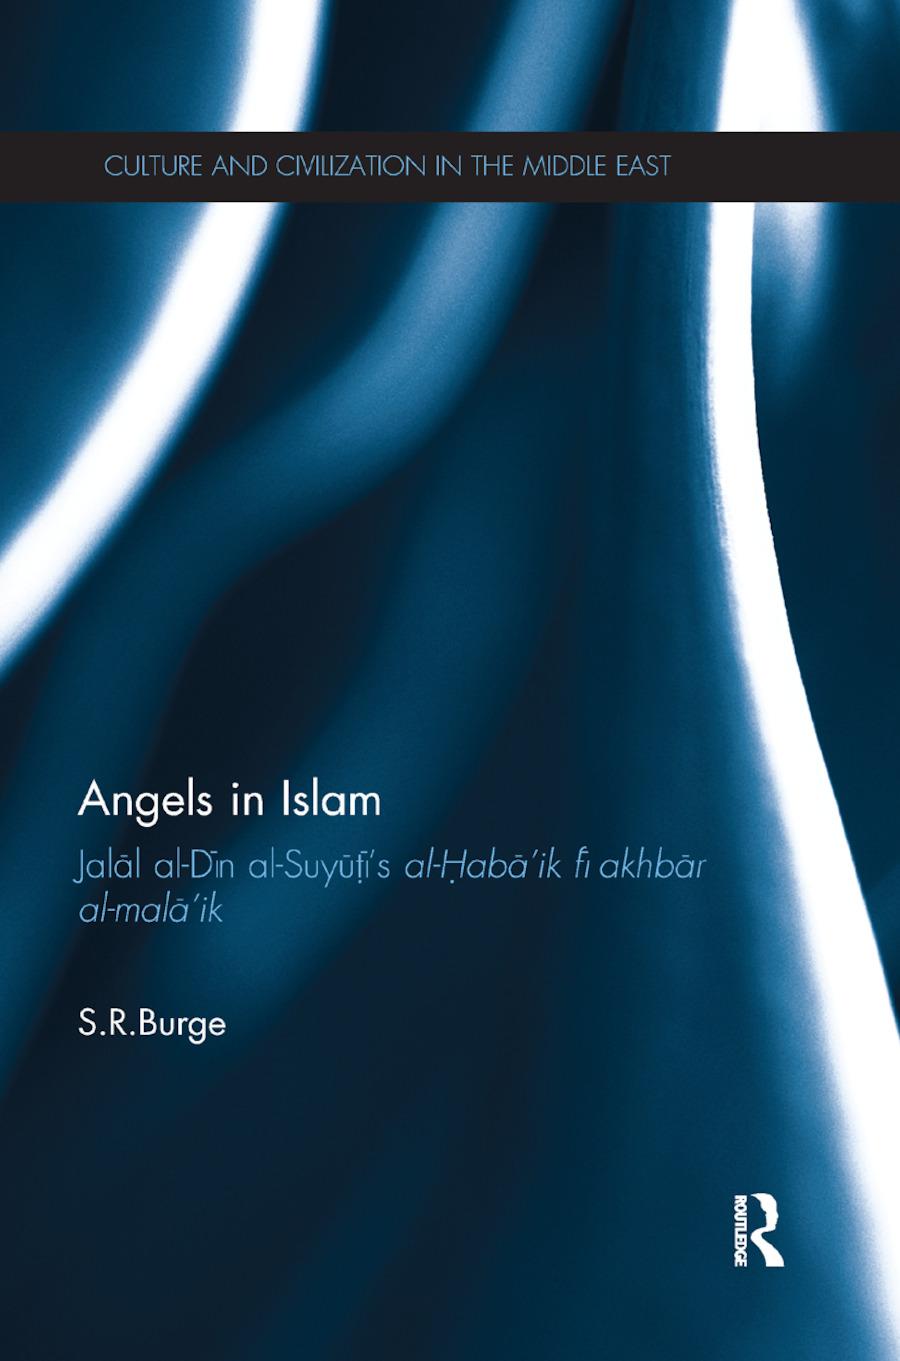 Angels in Islam: Jalal al-Din al-Suyuti's al-Haba'ik fi akhbar al-mala'ik book cover